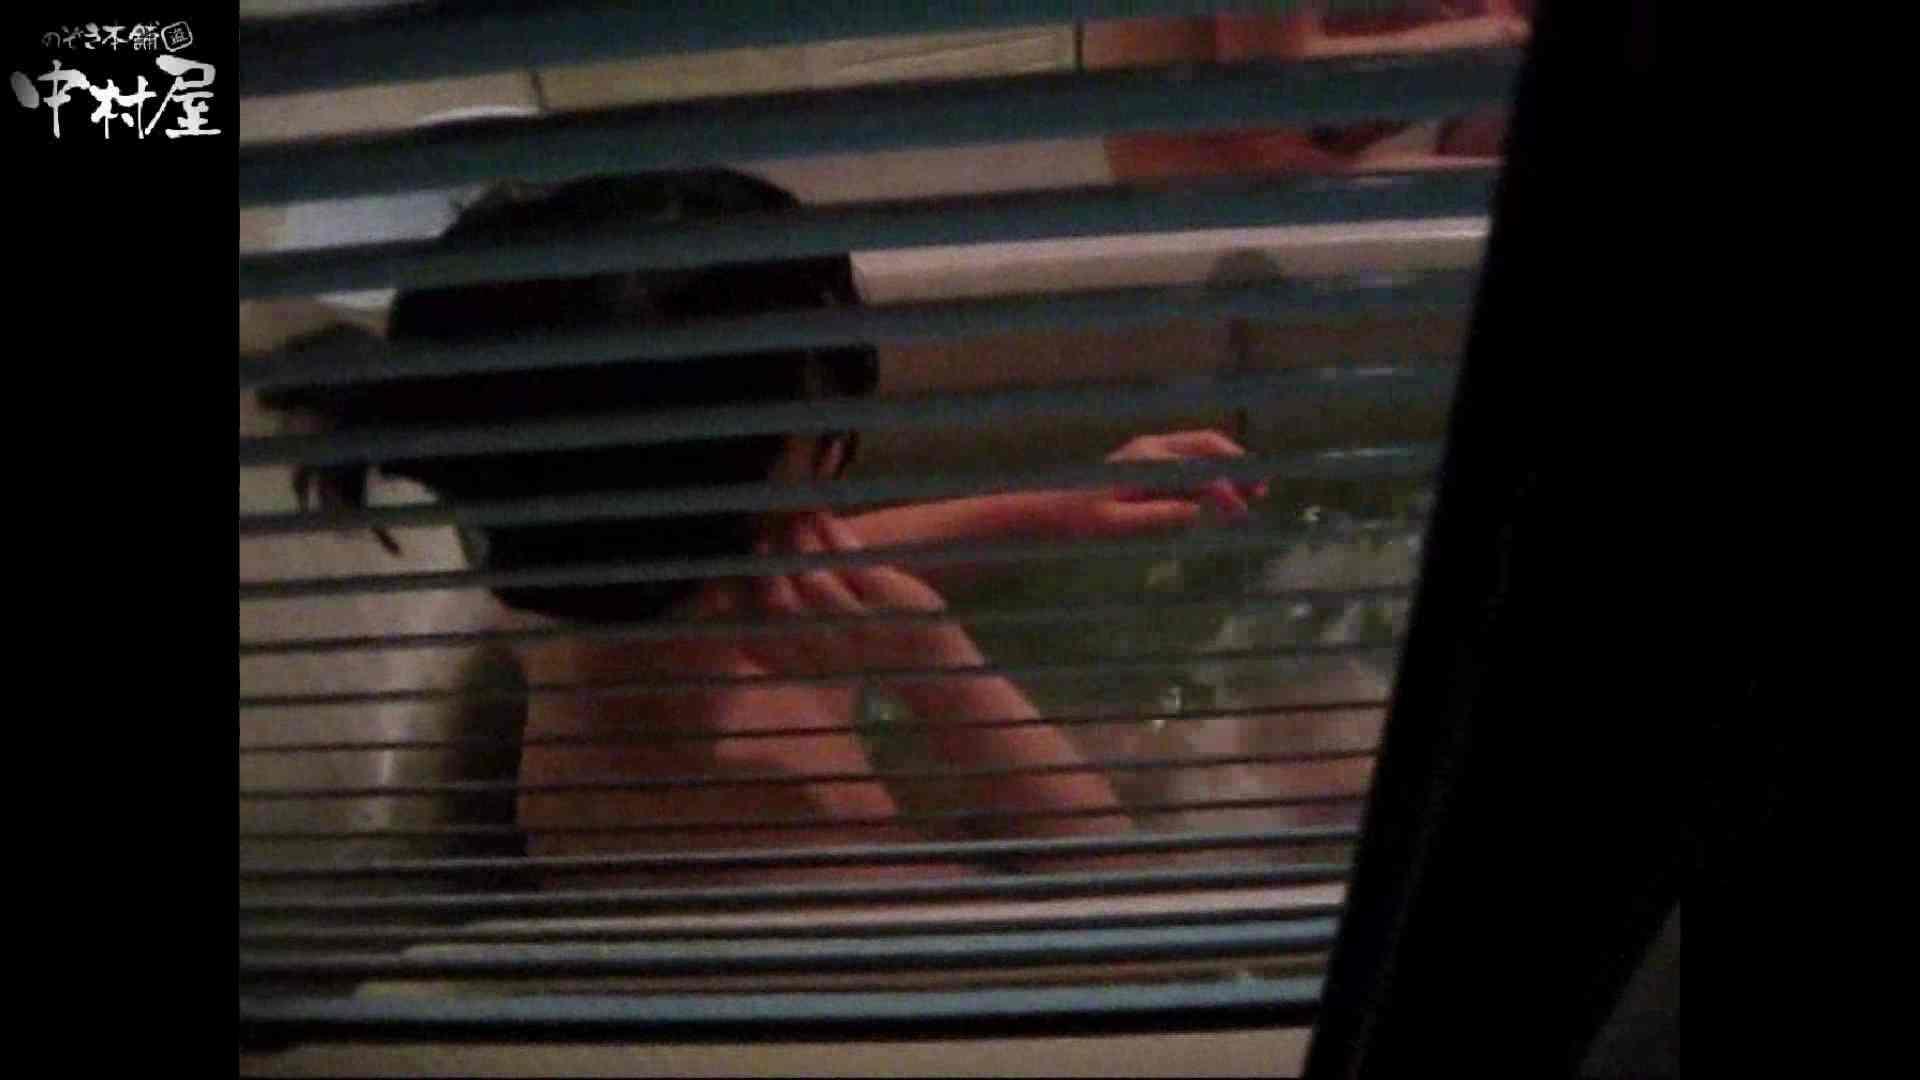 民家風呂専門盗撮師の超危険映像 vol.007 股間 | OLのエロ生活  103連発 55